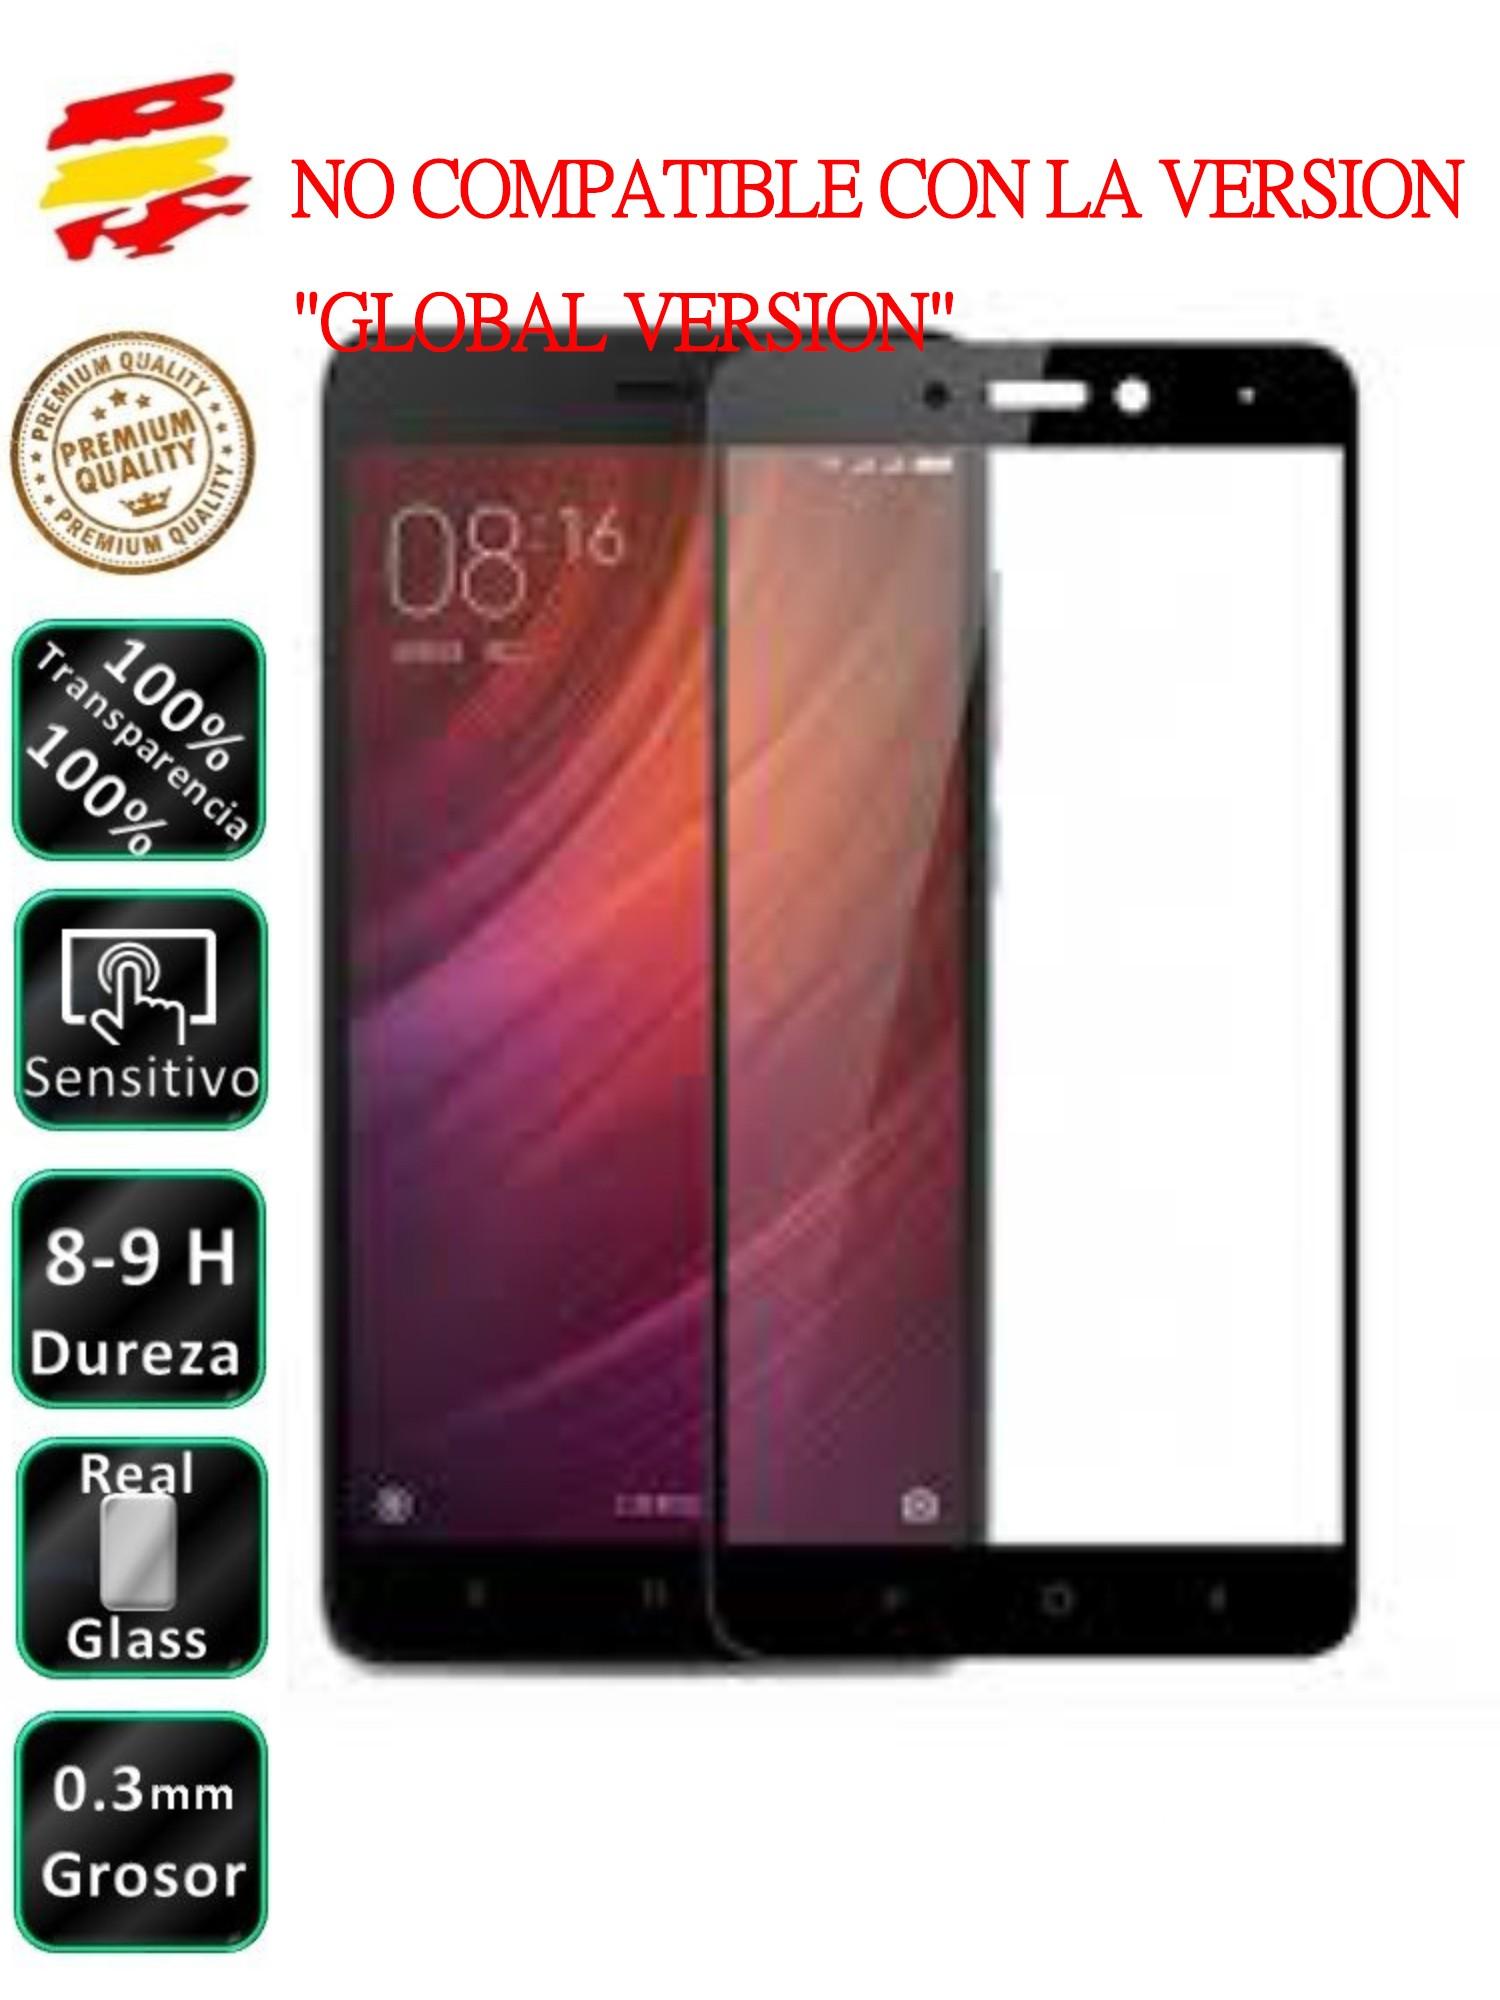 Protector Xiaomi Redmi Note 4 Black Full 3D Tempered Glass Screen